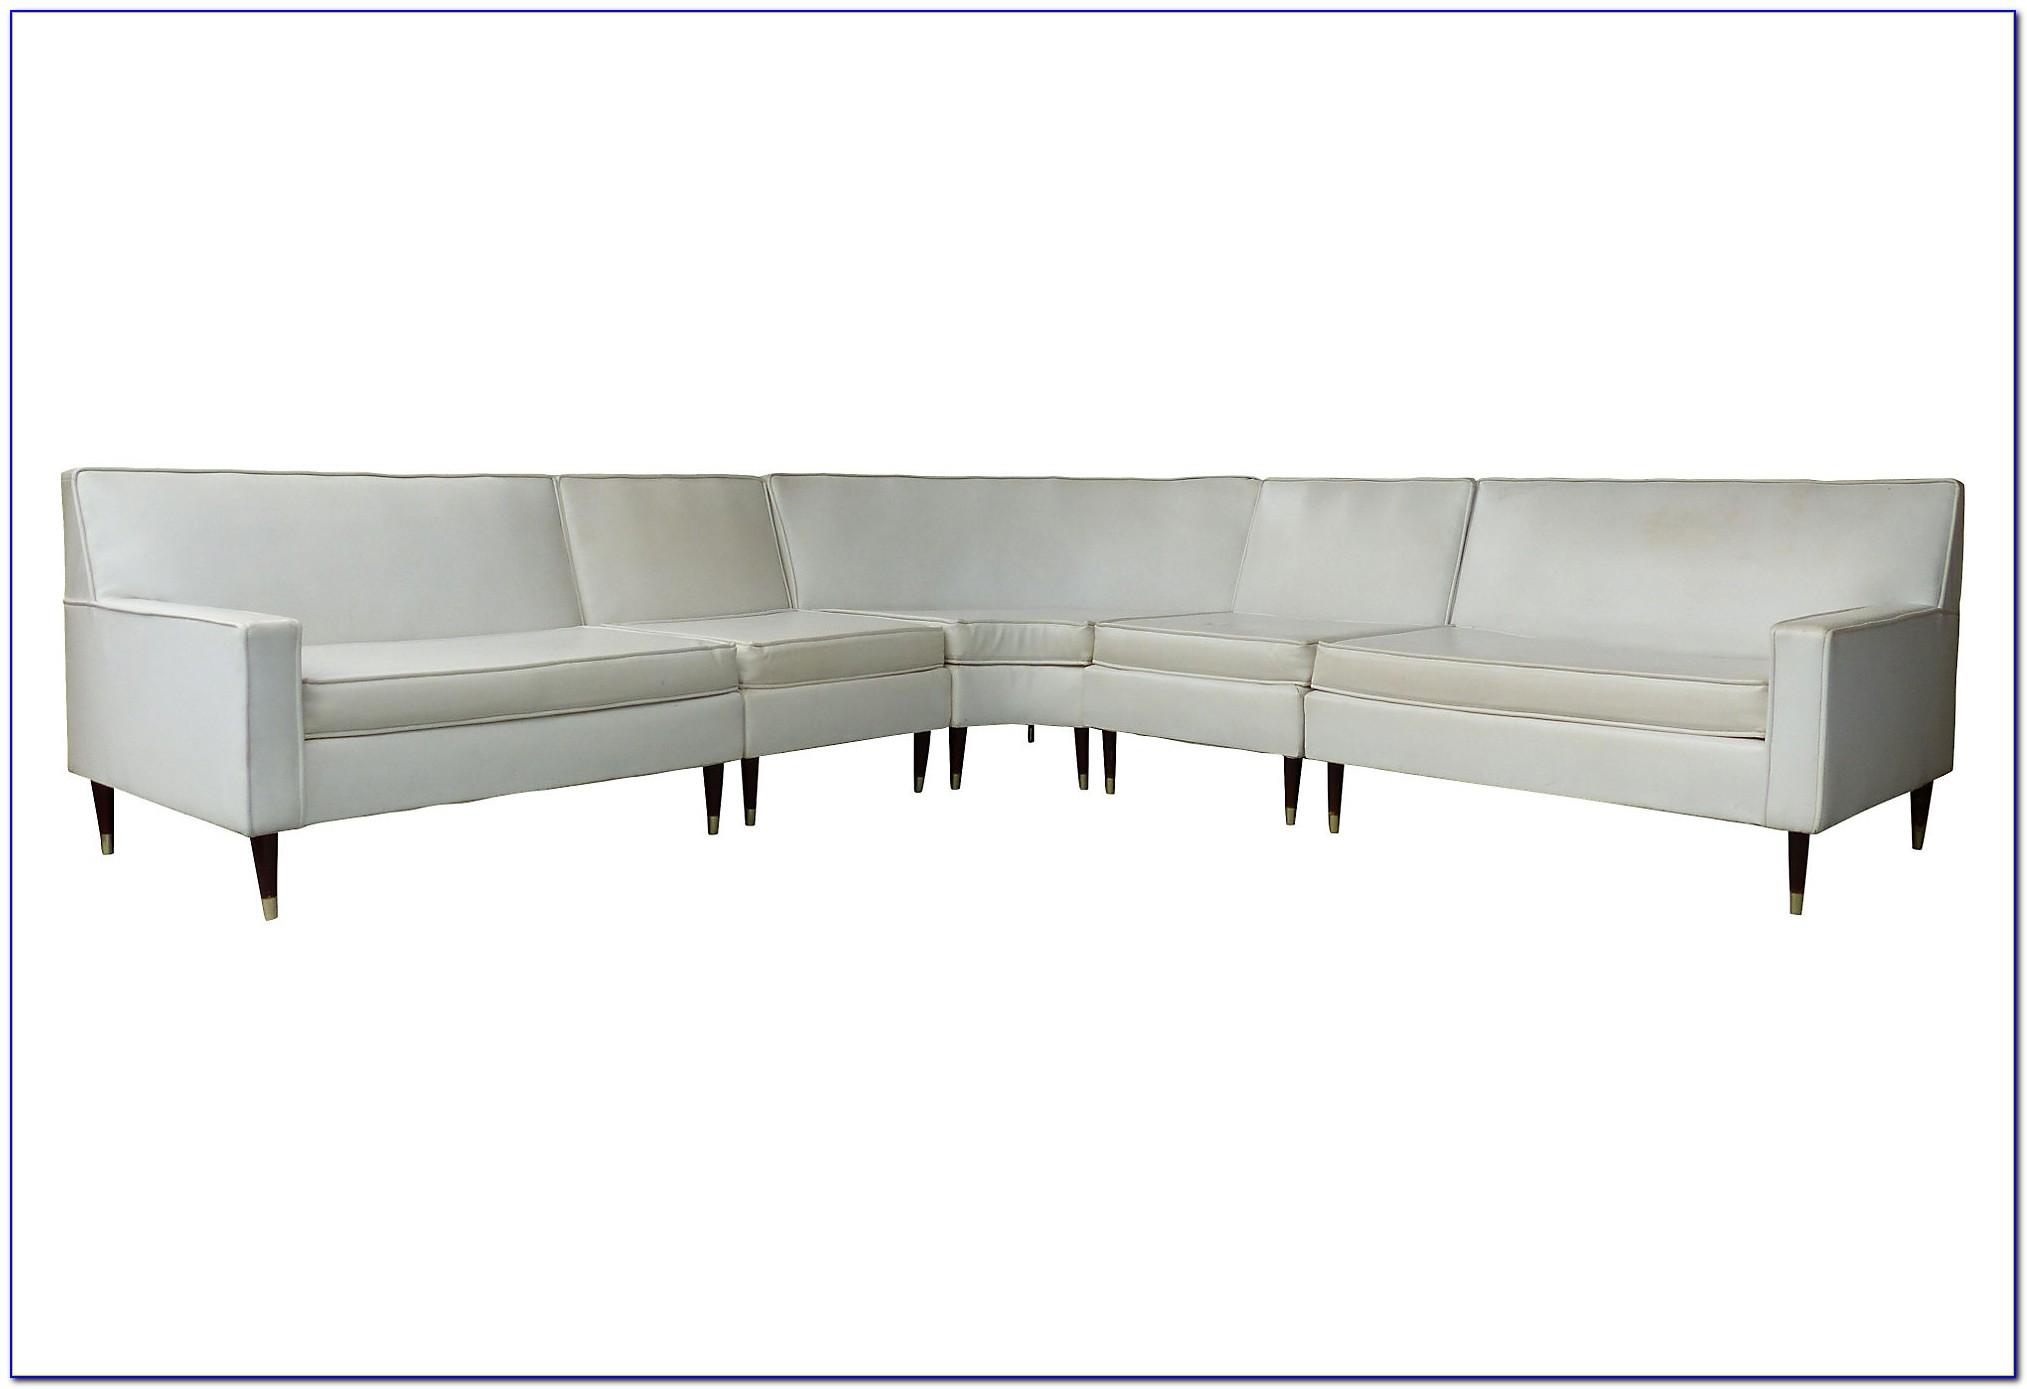 Vintage Mid Century Sectional Sofa